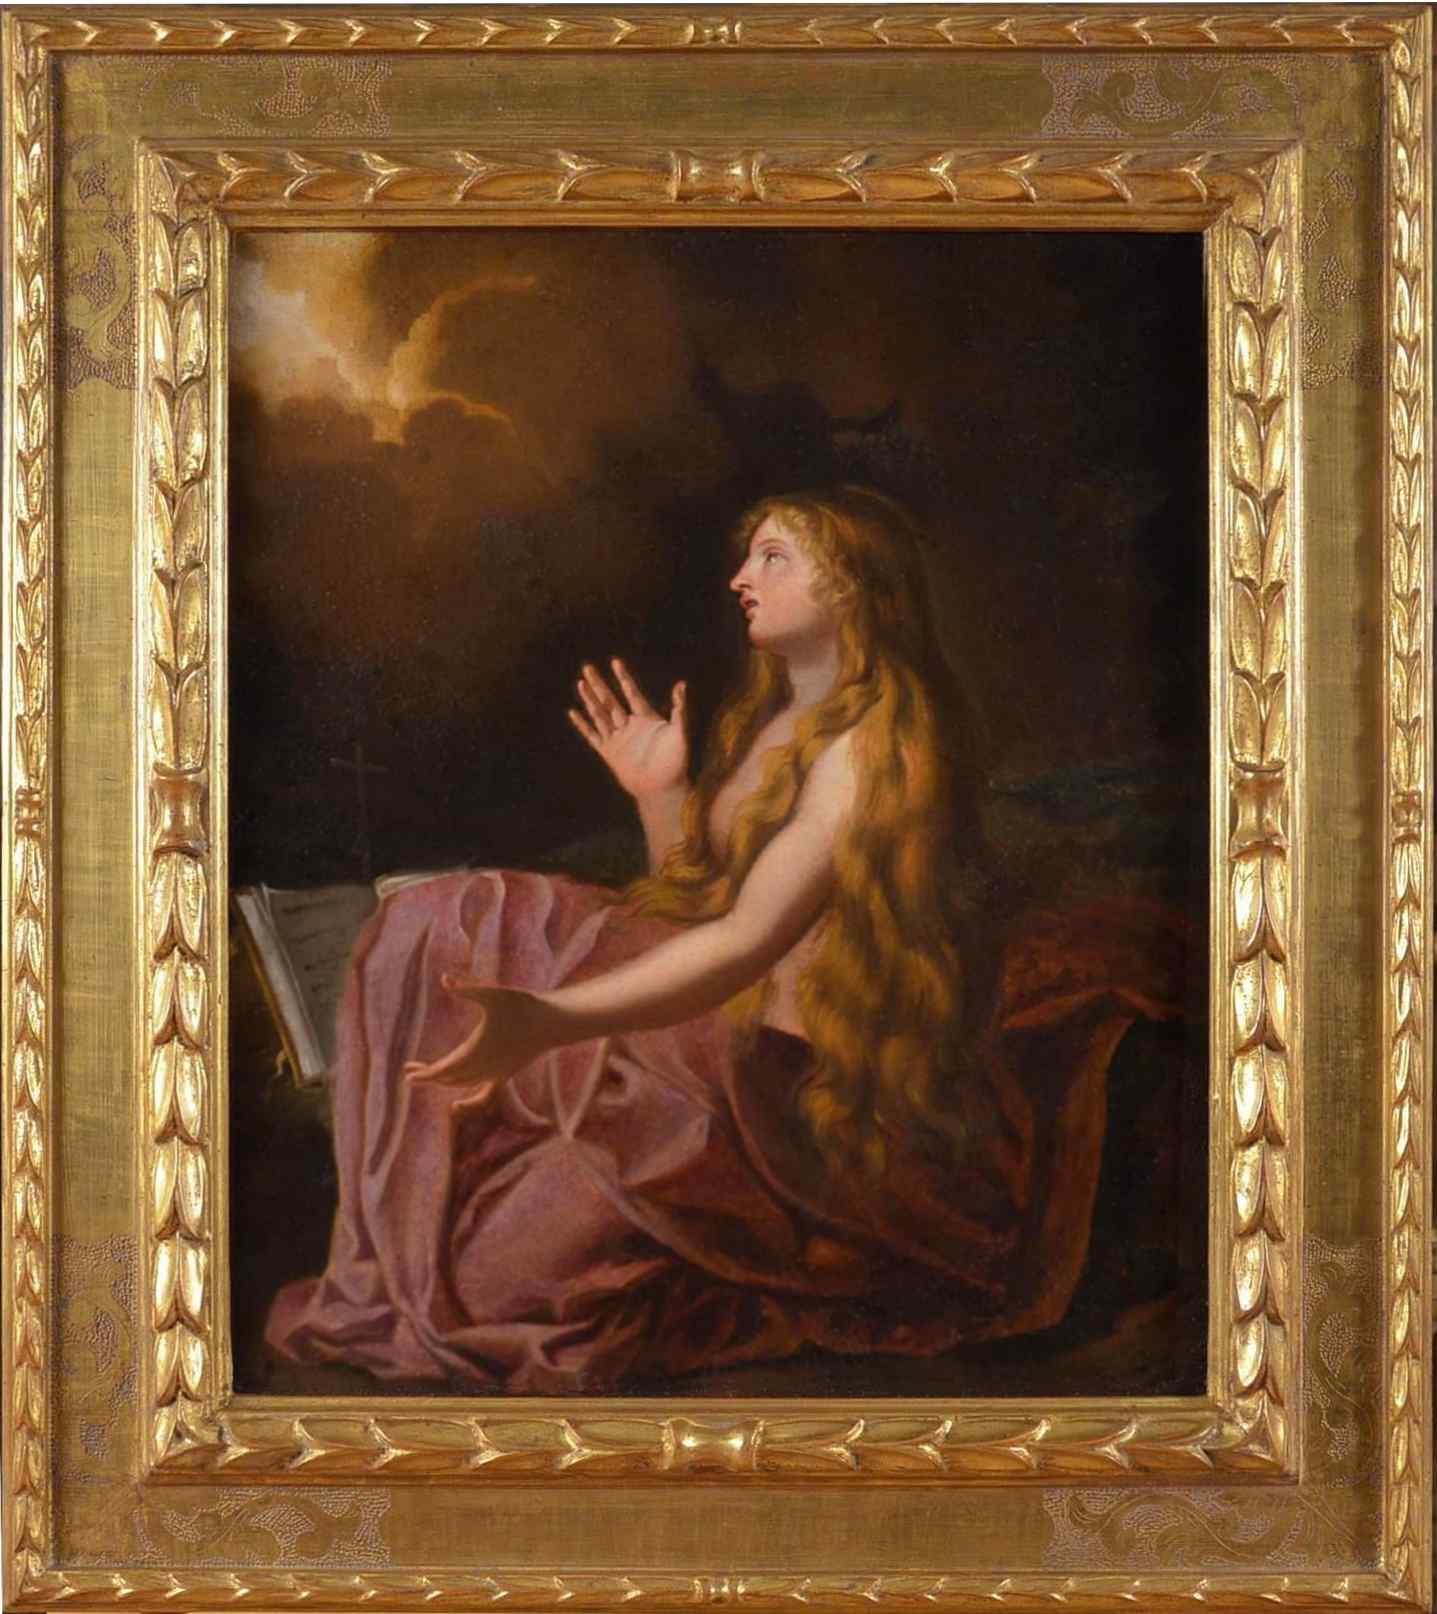 Мария Маддалена, старая живопись семнадцатого века